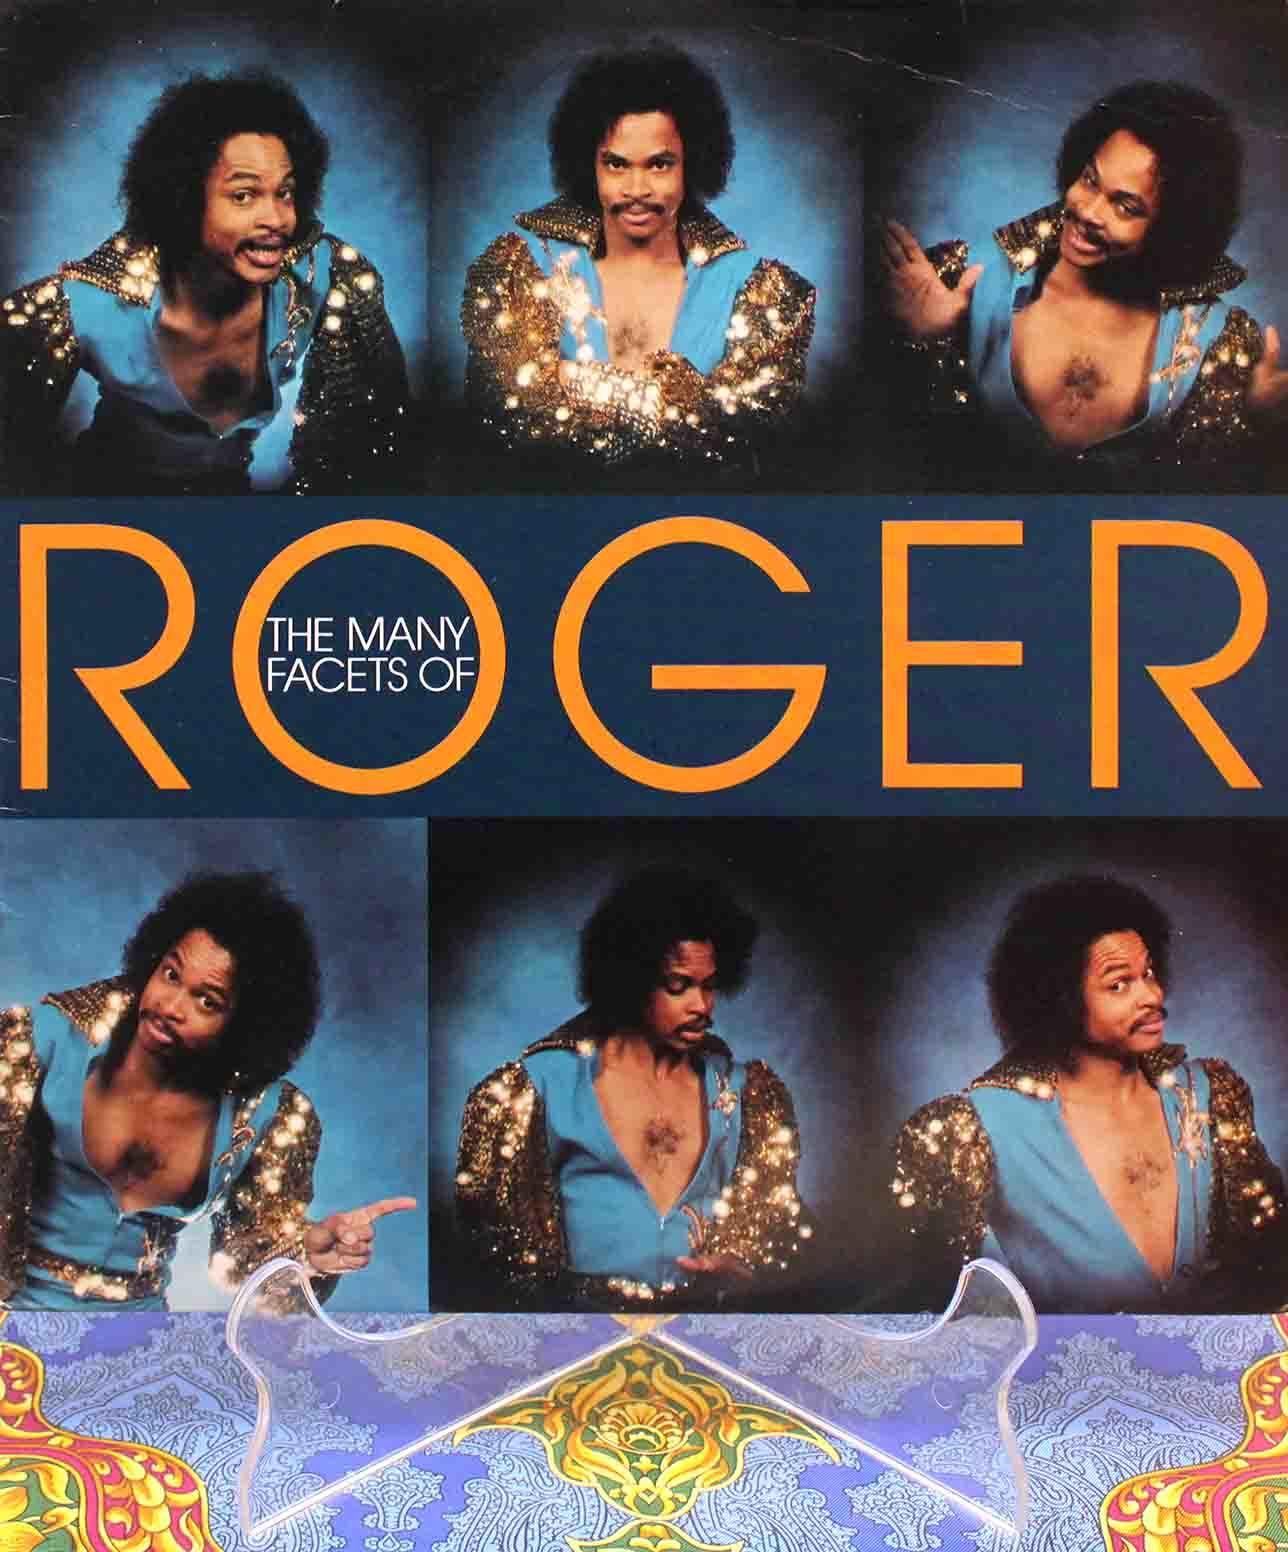 Roger LP 01